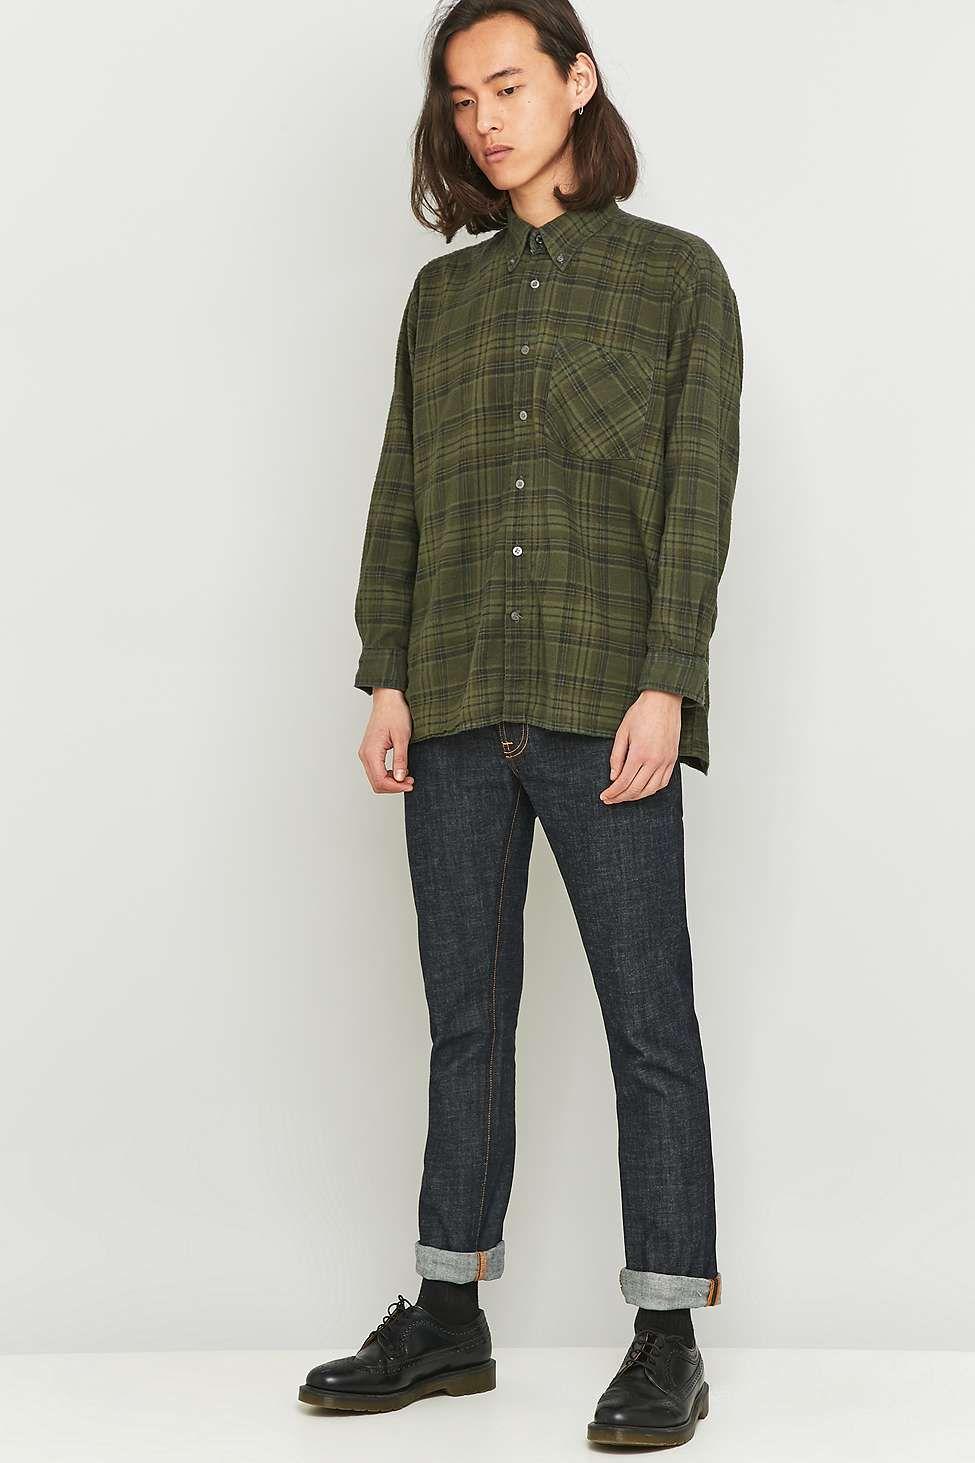 Flannel shirt vintage  Urban Renewal Vintage Customised Olive Flannel Shirt  Urban renewal